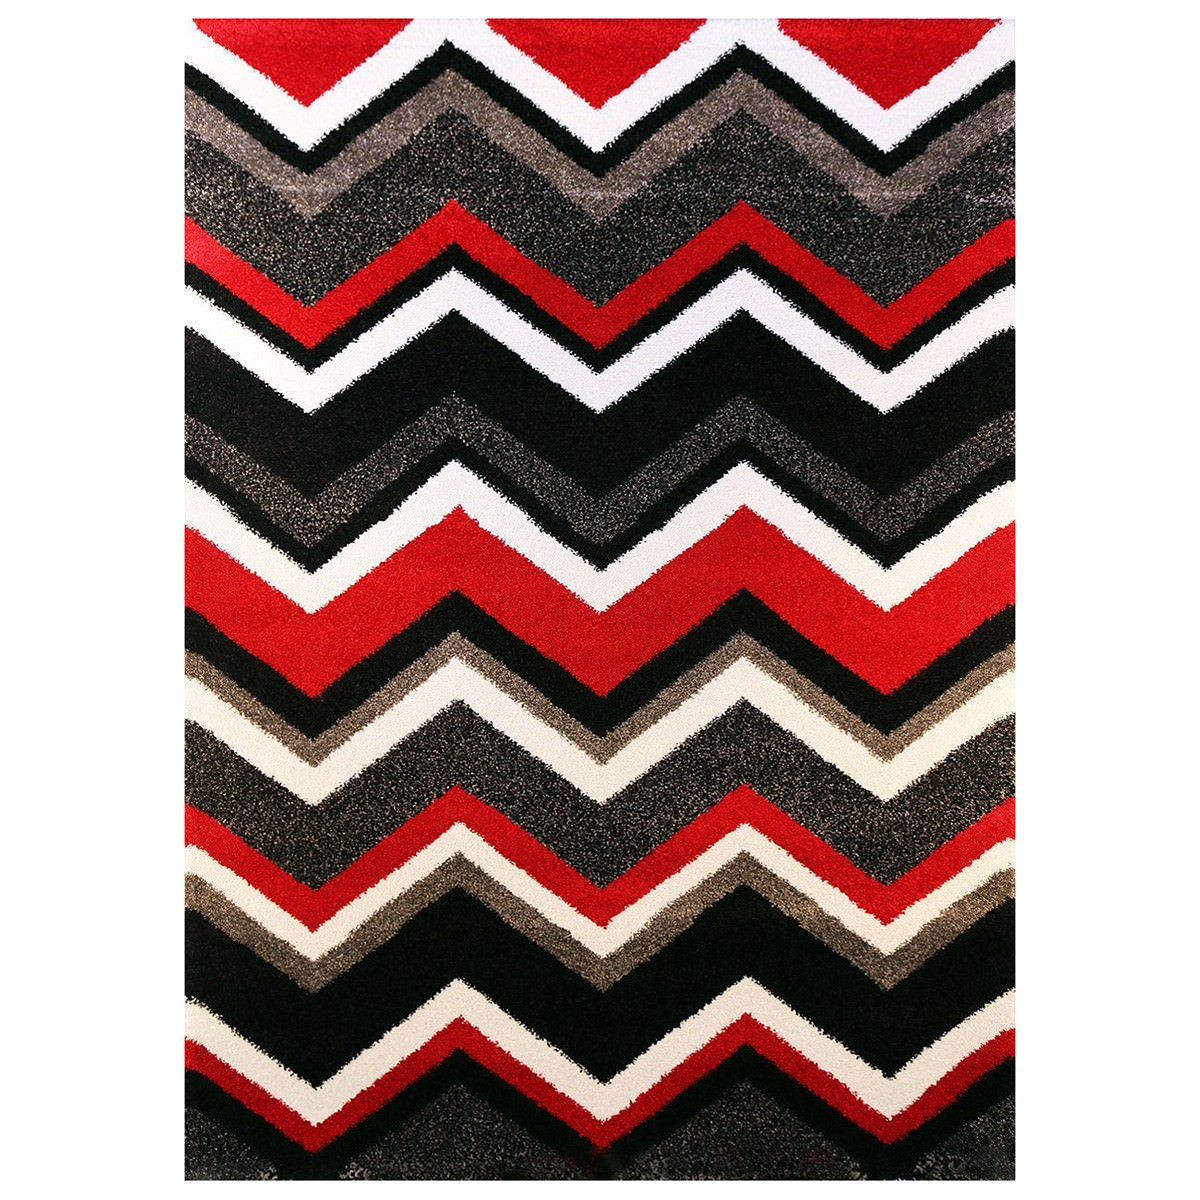 Valens Chevron Modern Rug, 200x290cm, Red / Black